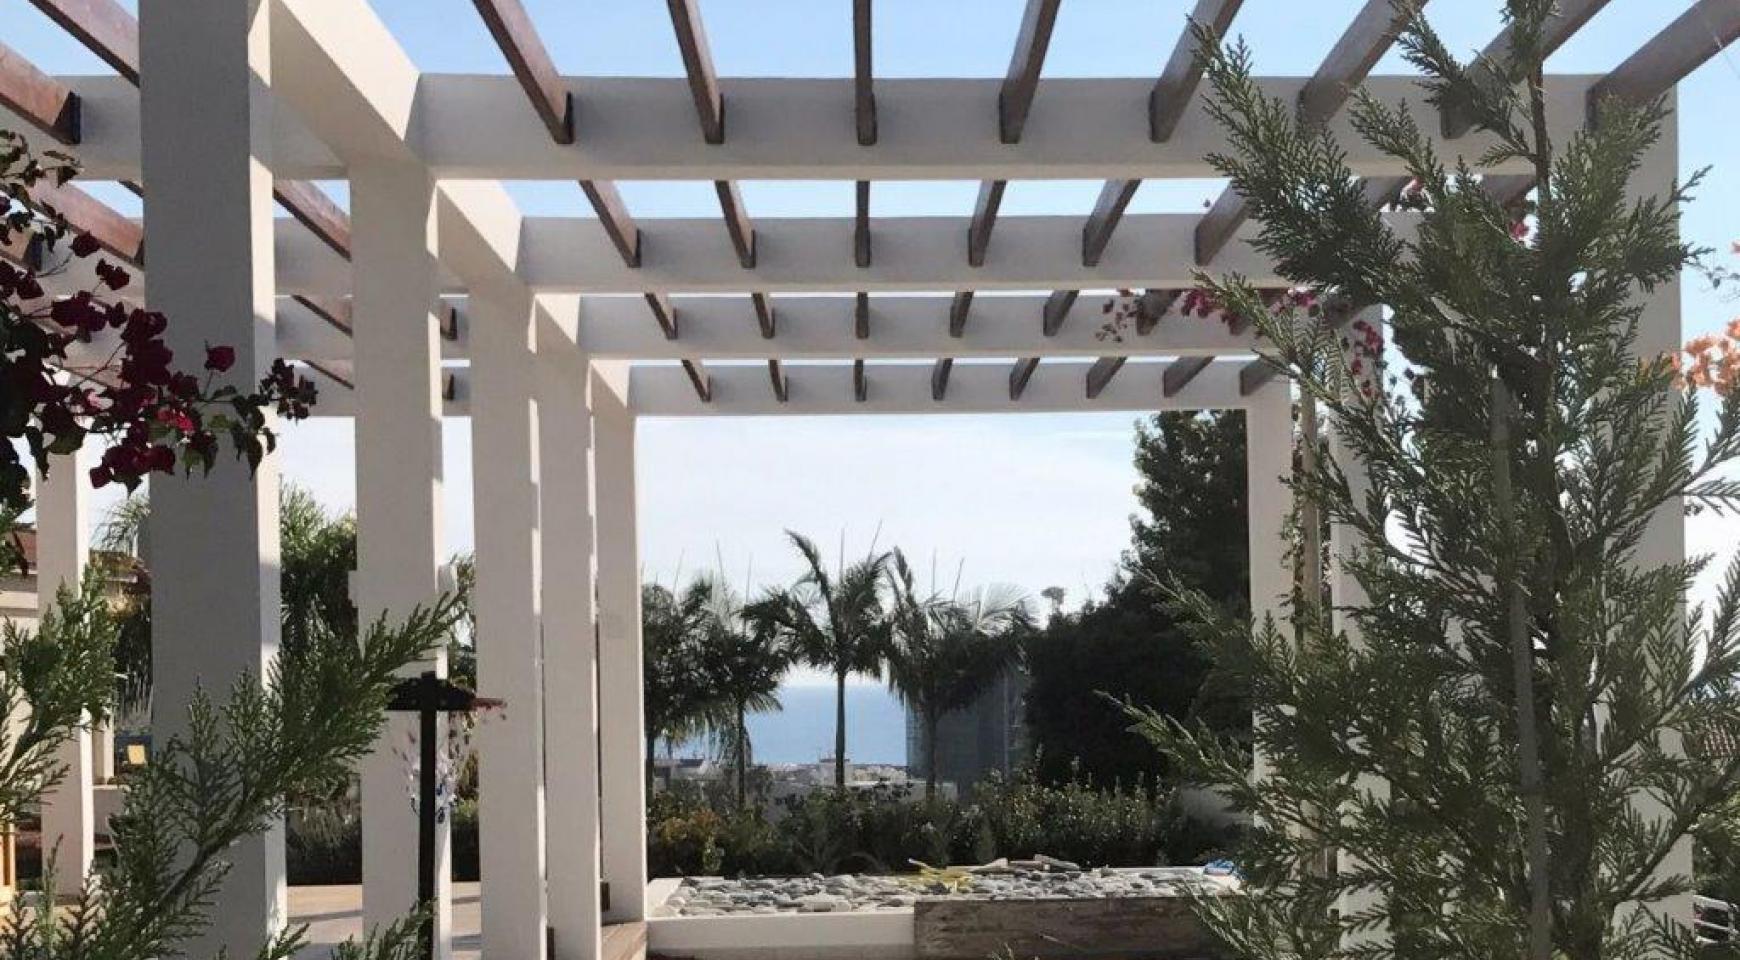 5-Спальная Вилла с видом на Море в районе  Agios Tychonas - 3